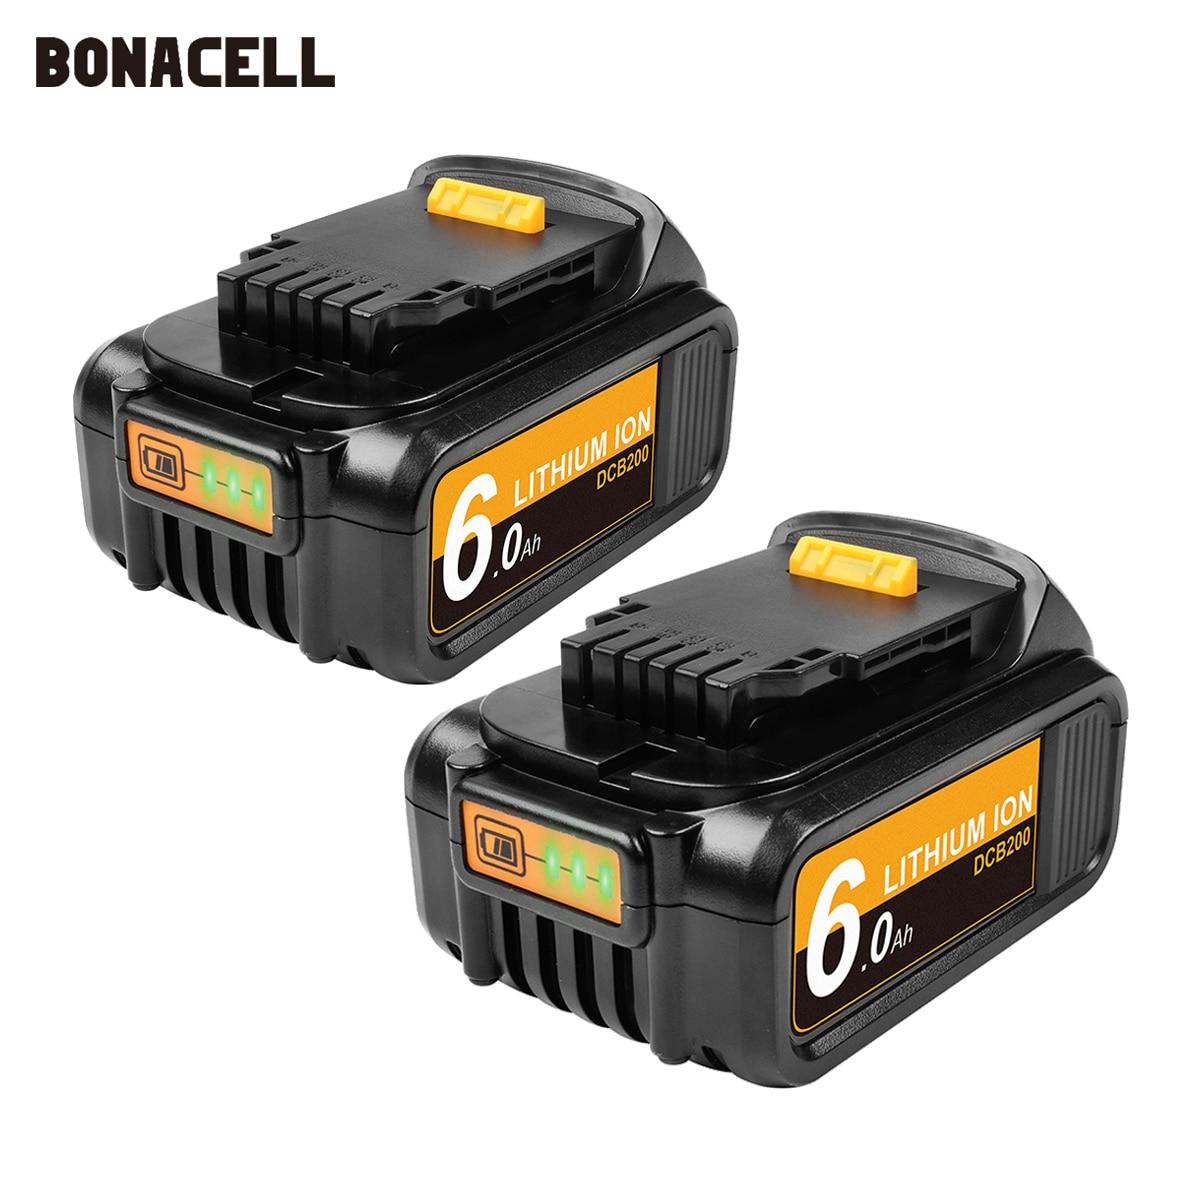 Bonacell 6000mAh 18V/20V XR dla Dewalt akumulator do DCB180 DCB181 DCB182 DCB201 DCB201-2 DCB200 DCB200-2 DCB204-2 L50